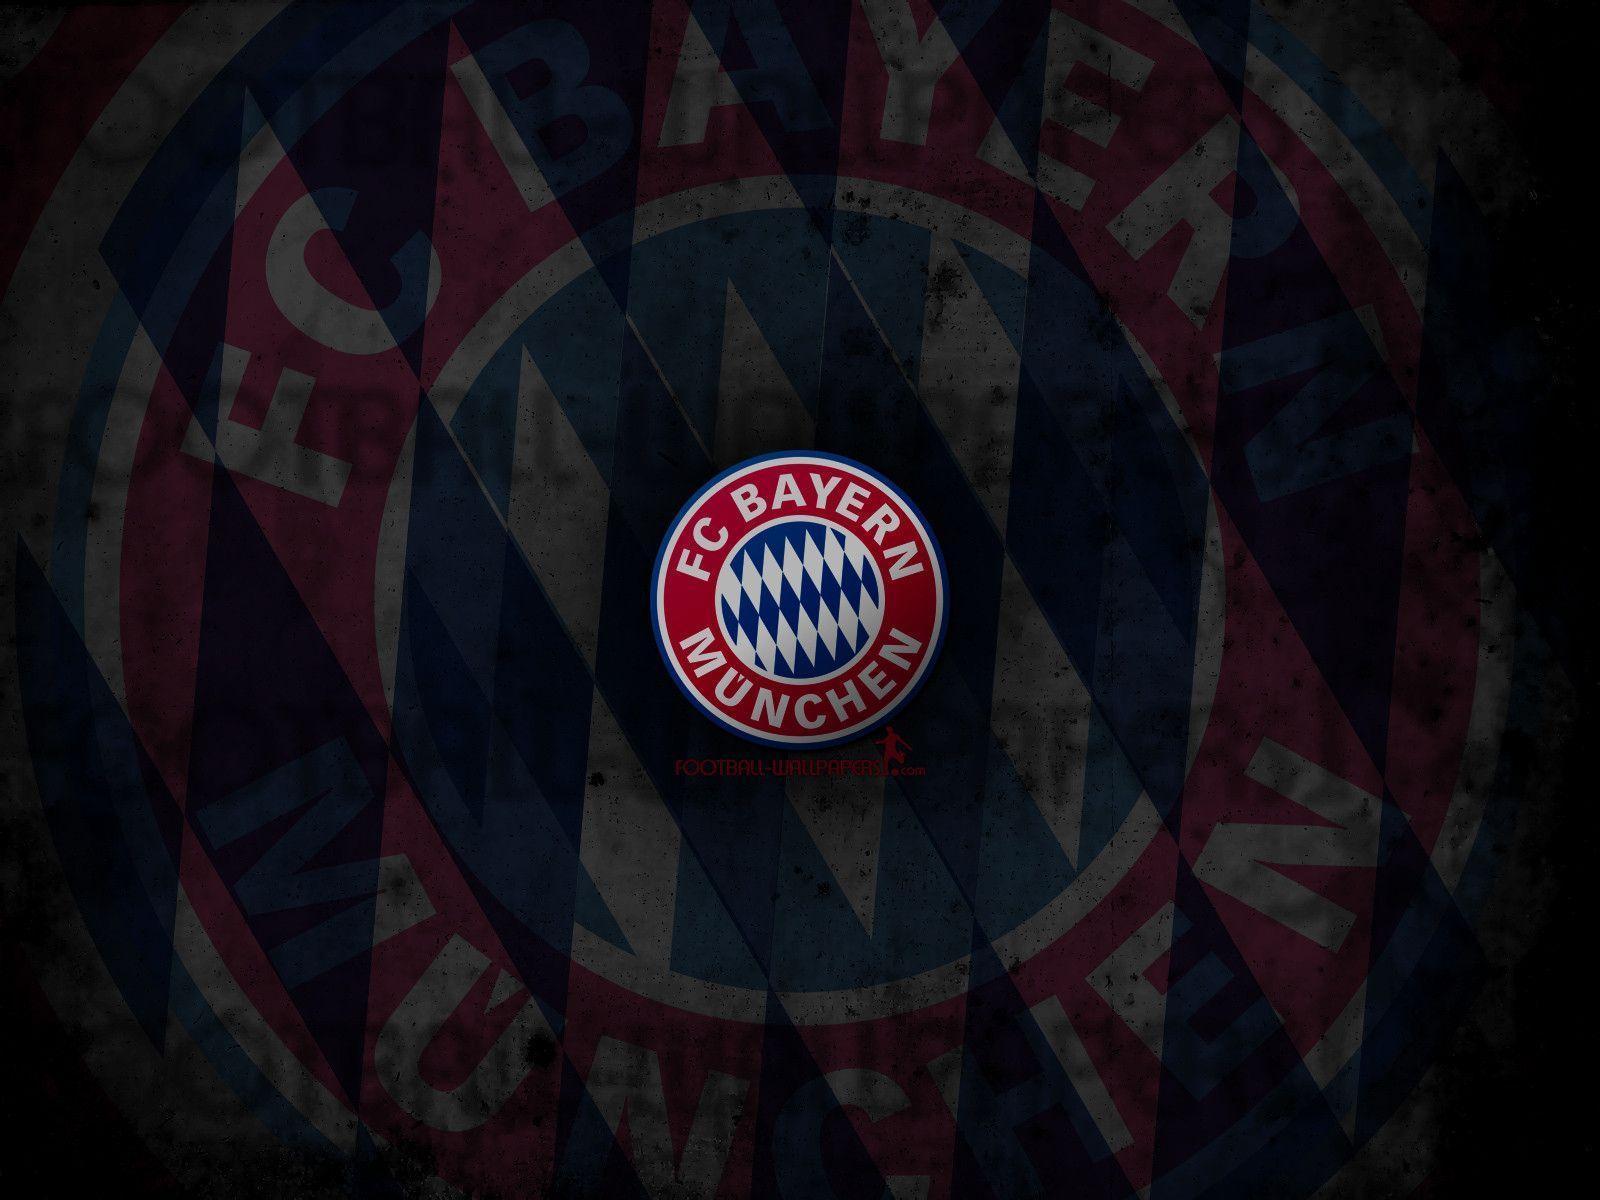 FC Bayern München - FC Bayern Munich Wallpaper (10565930) - Fanpop